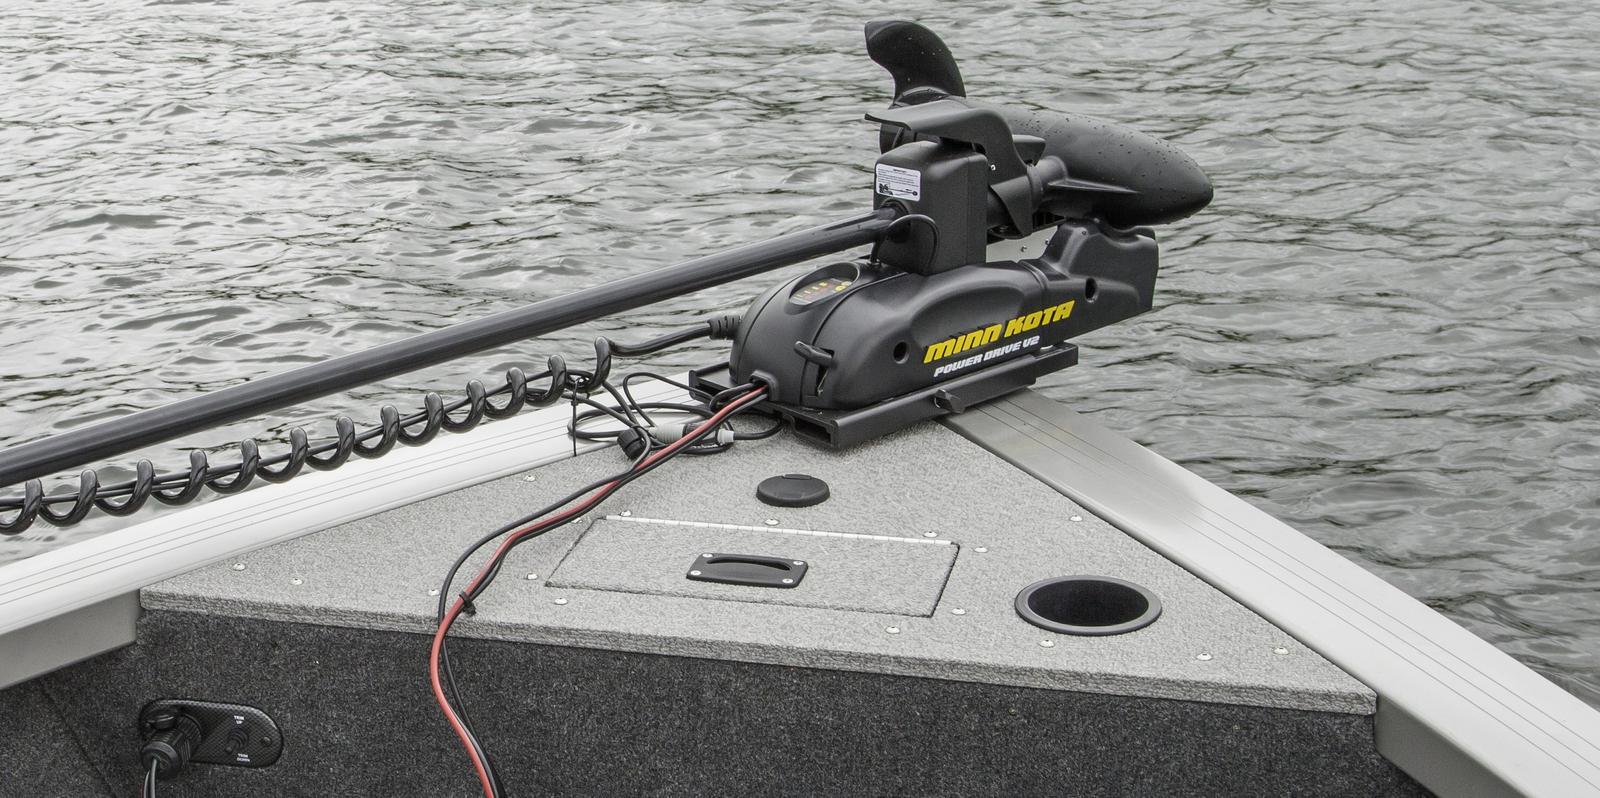 2019 Crestliner Pro Tiller 1650 For Sale In Ravenna Oh Pontoon Boat Wiring Diagram Lo Bow Baitwell